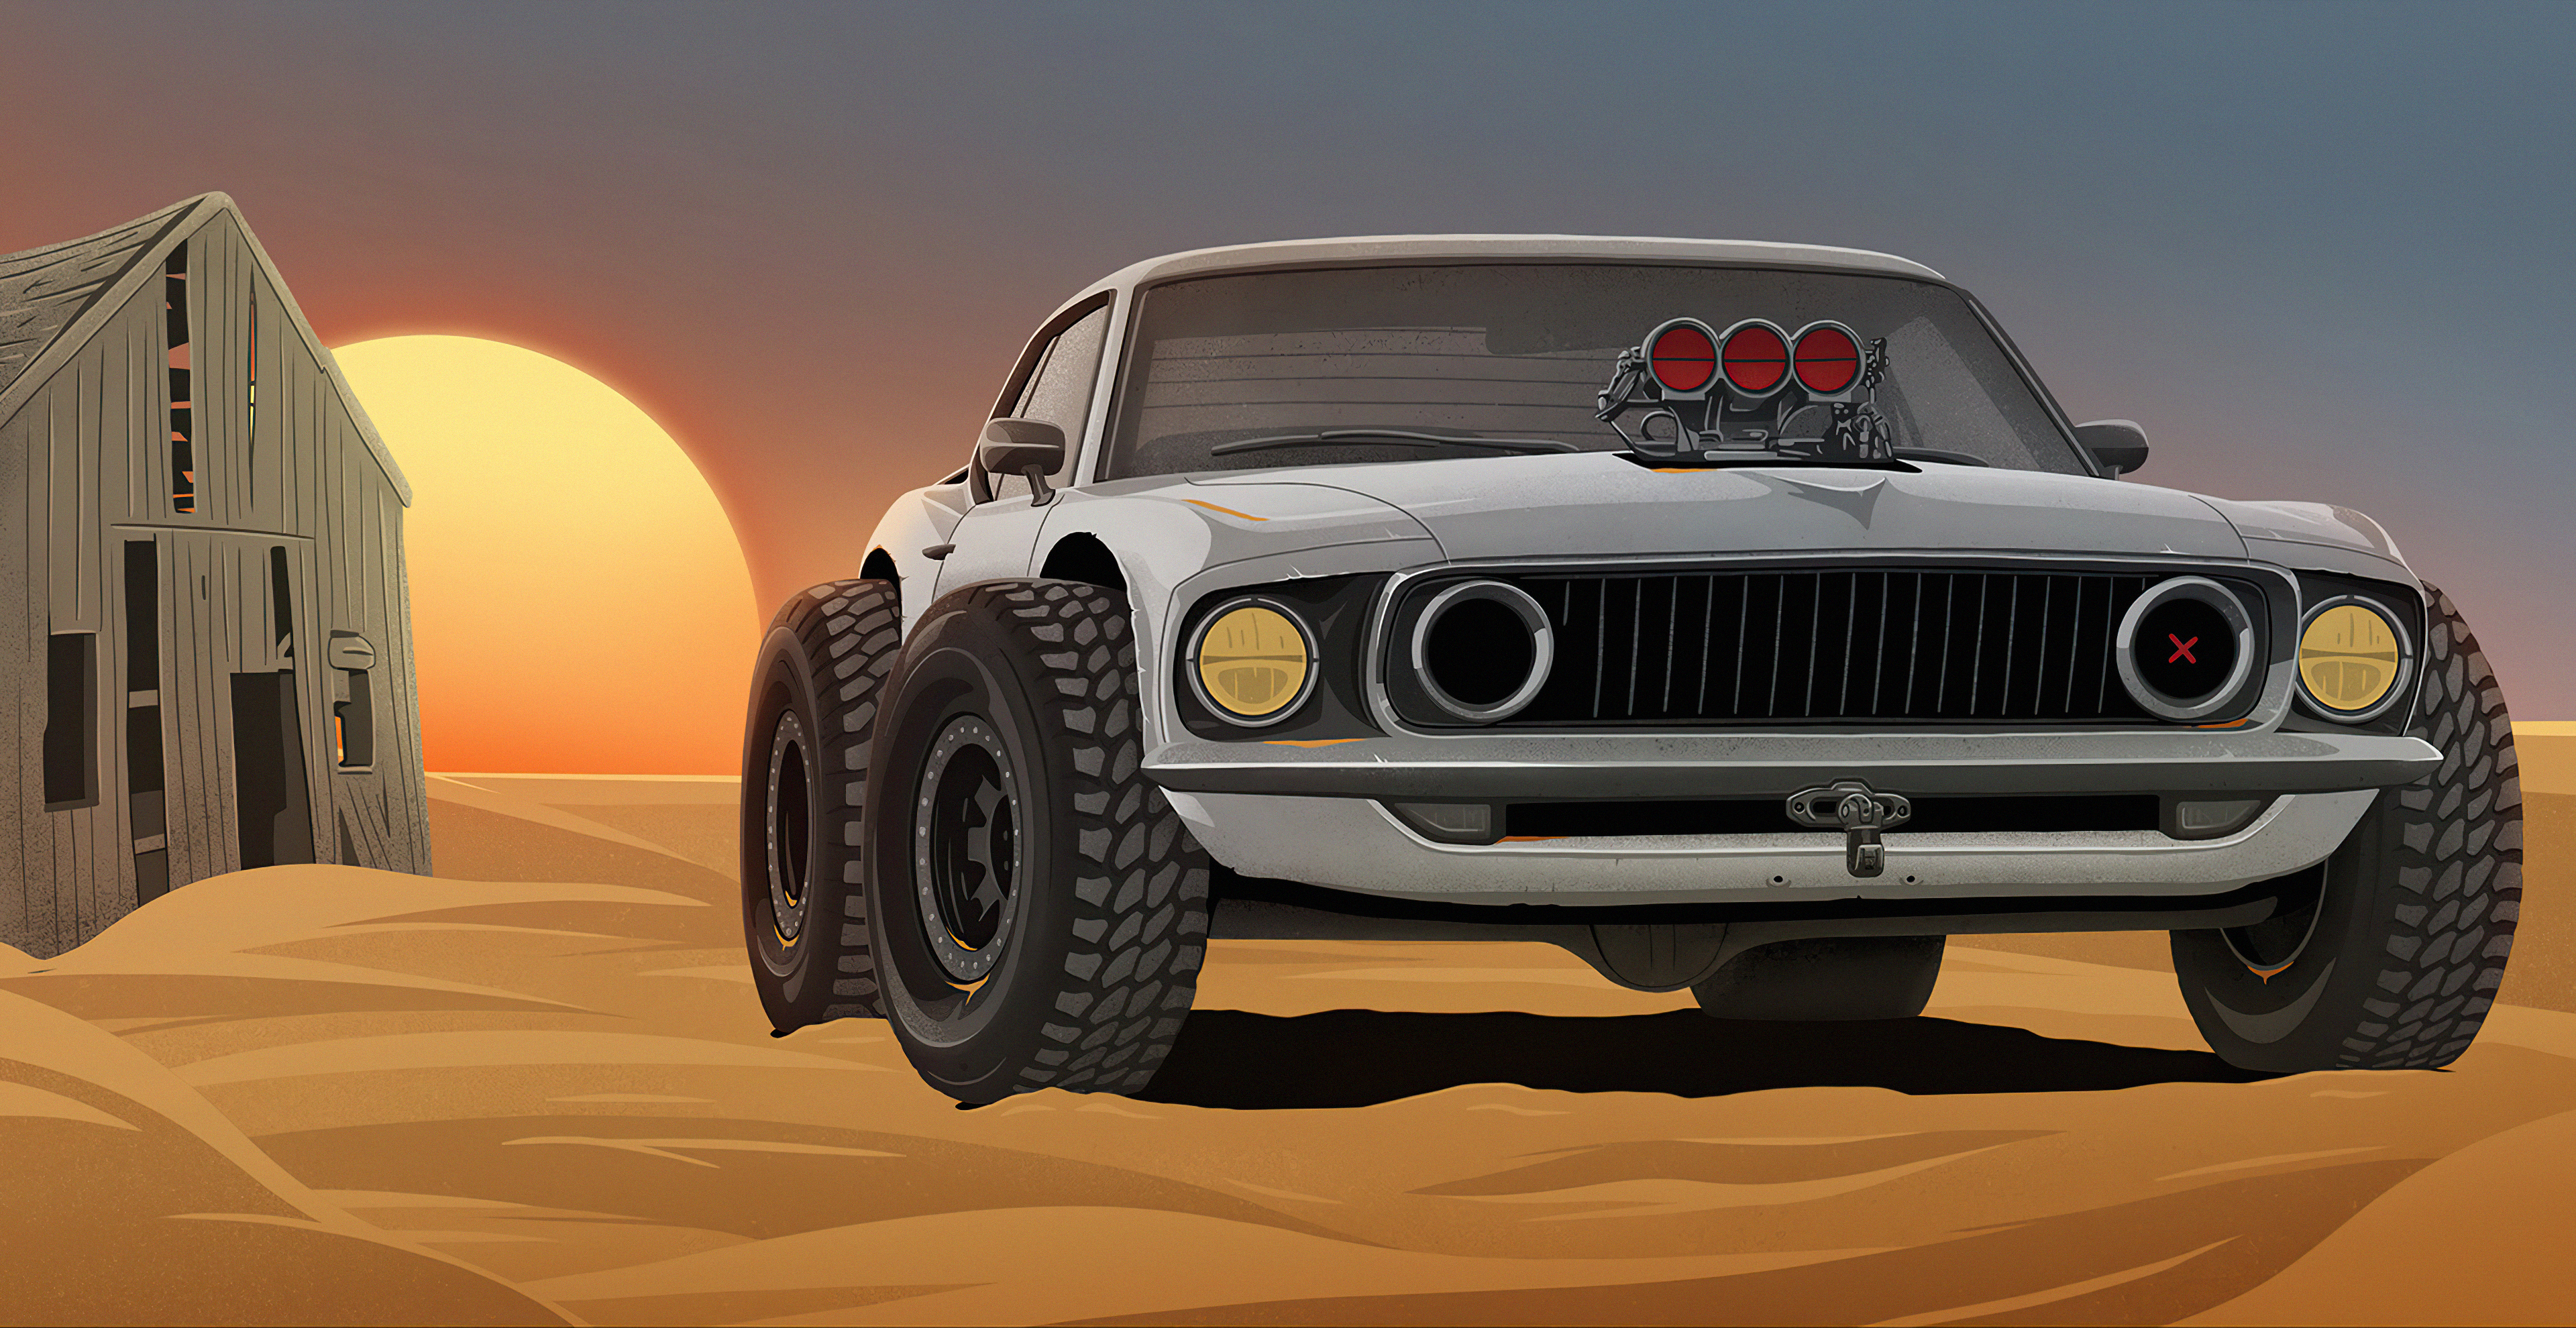 classic car in desert 4k 1618130520 - Classic Car In Desert 4k - Classic Car In Desert 4k wallpapers